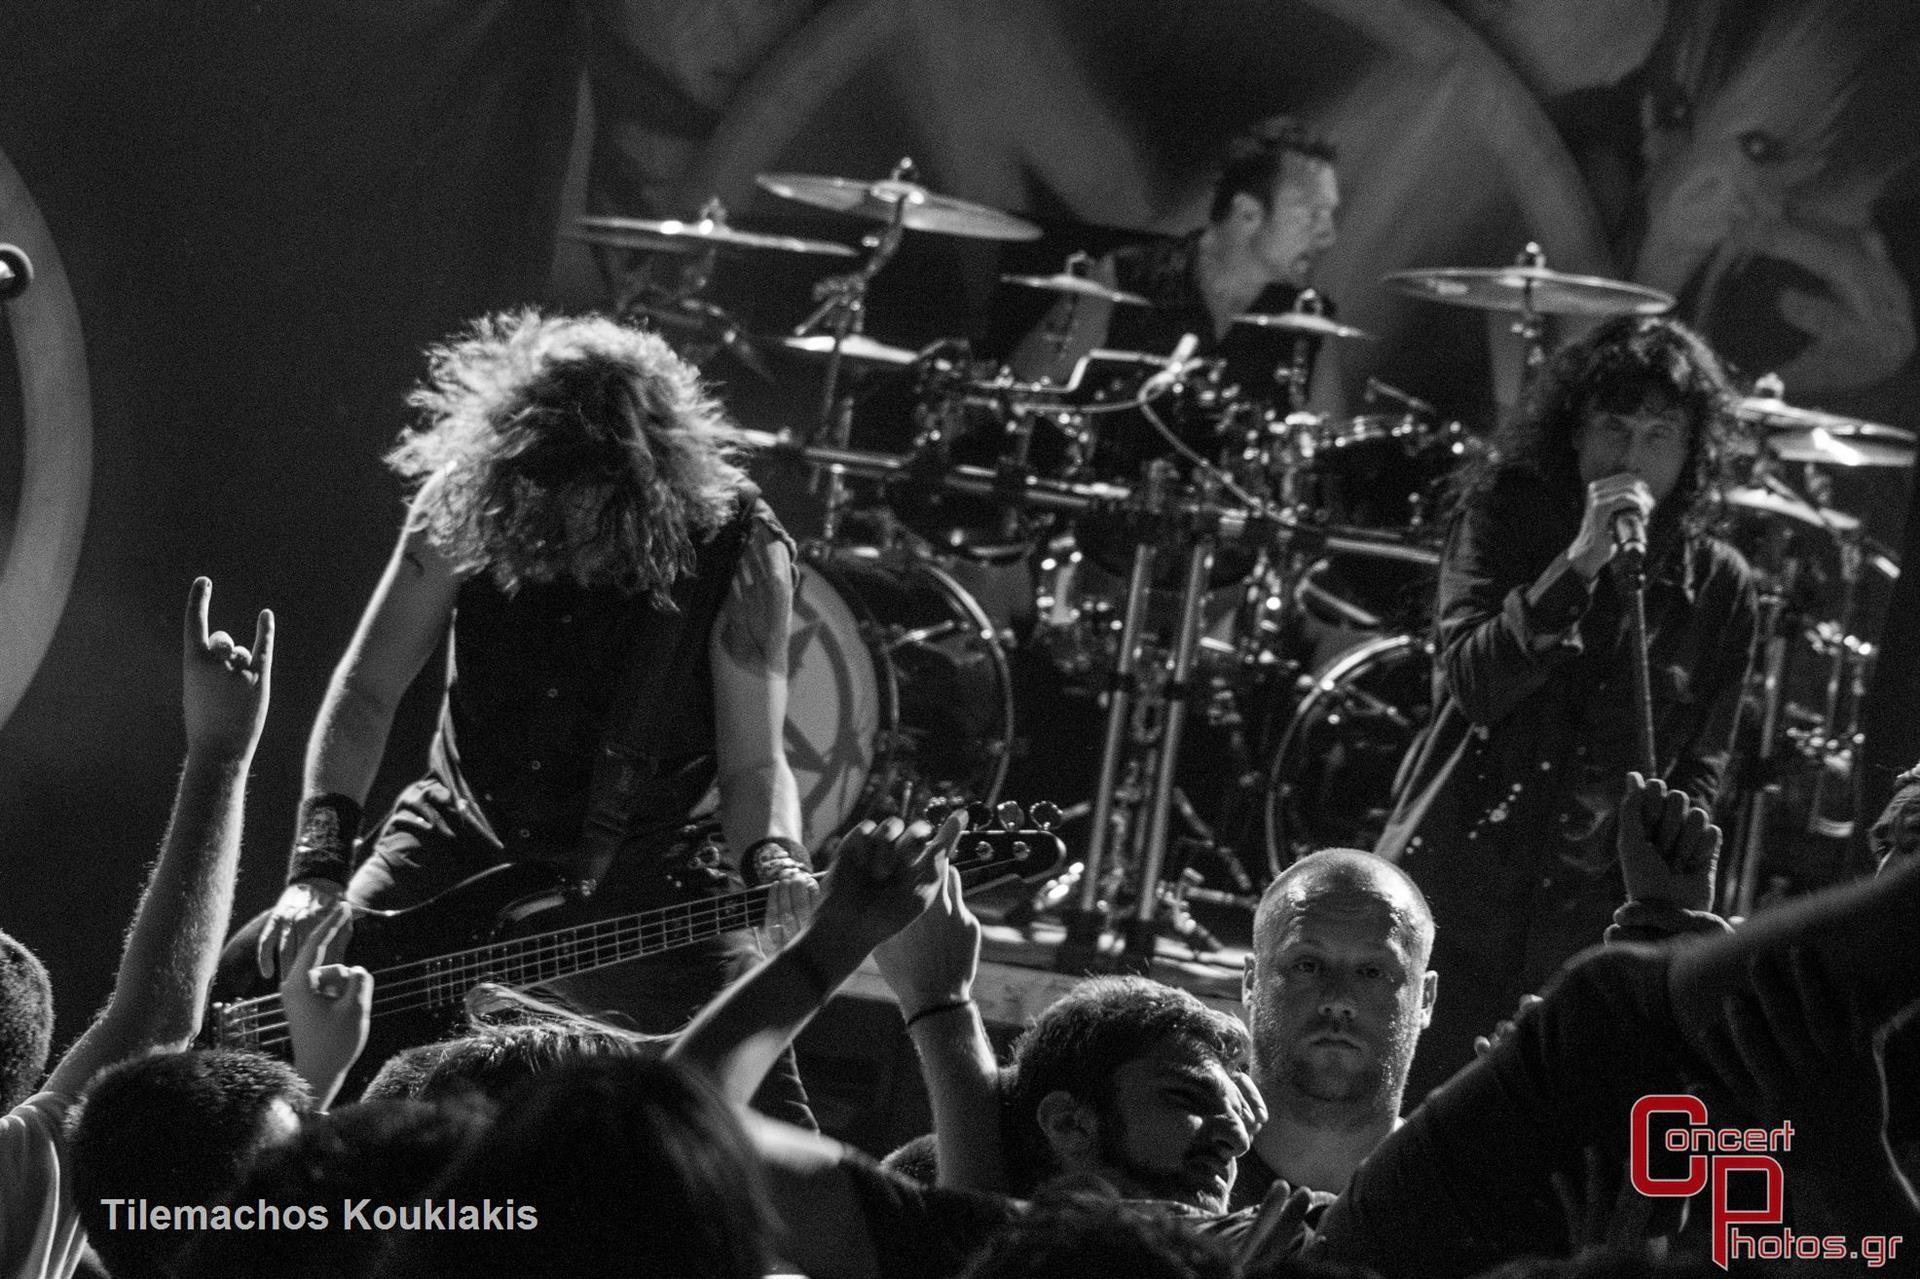 Anthrax-Anthrax photographer: Tilemachos Kouklakis - IMG_2233